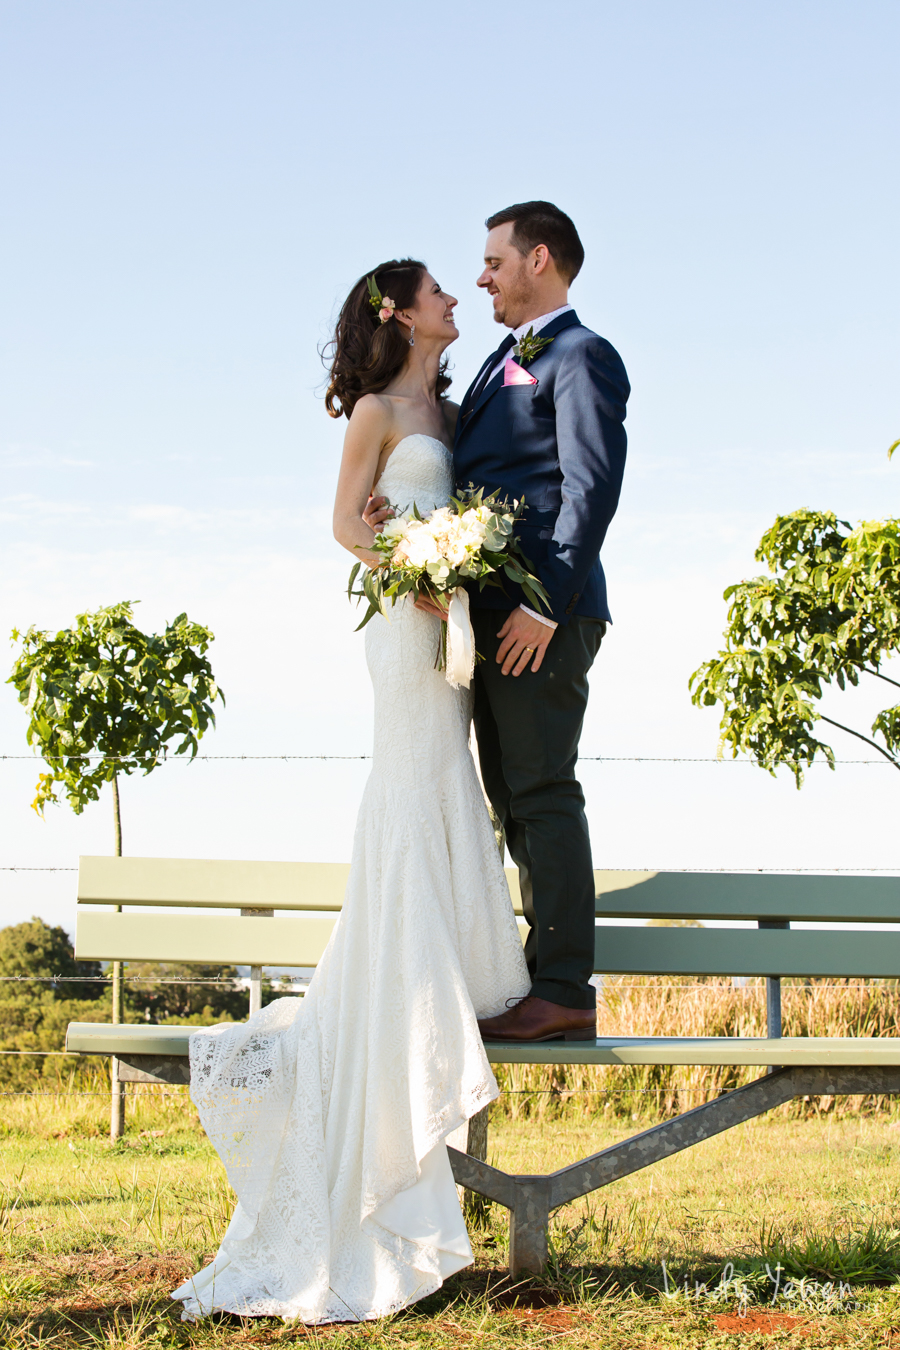 Montville-wedding-photographer-Lauren-Kirby 419.jpg